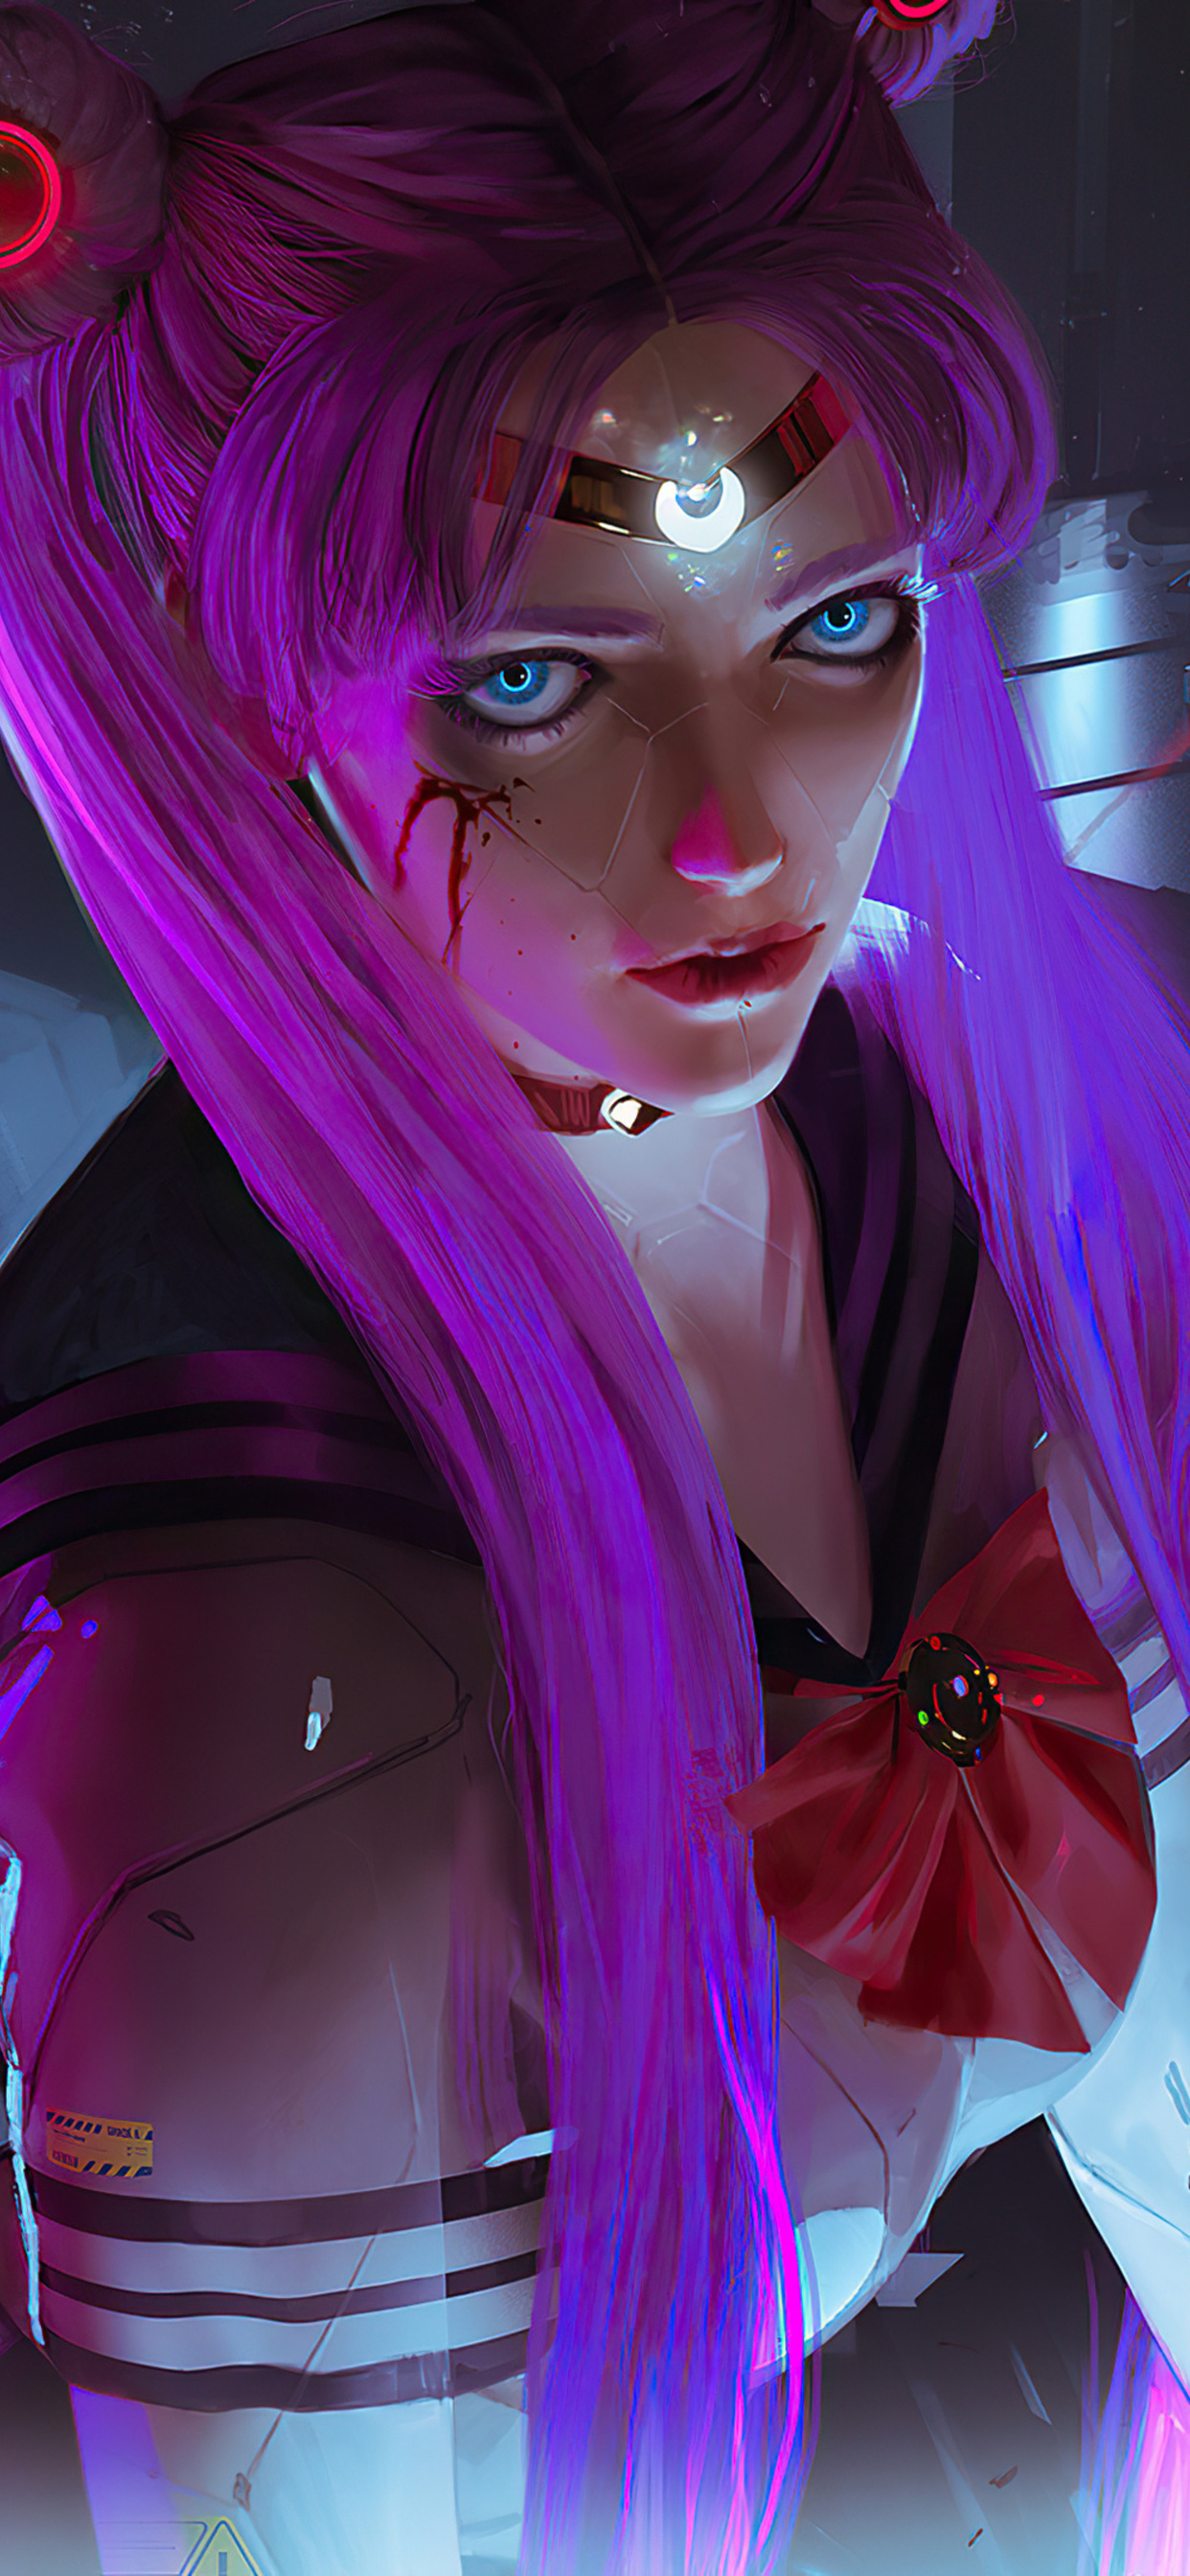 sailor-moon-cyberpunk-girl-4k-zq.jpg